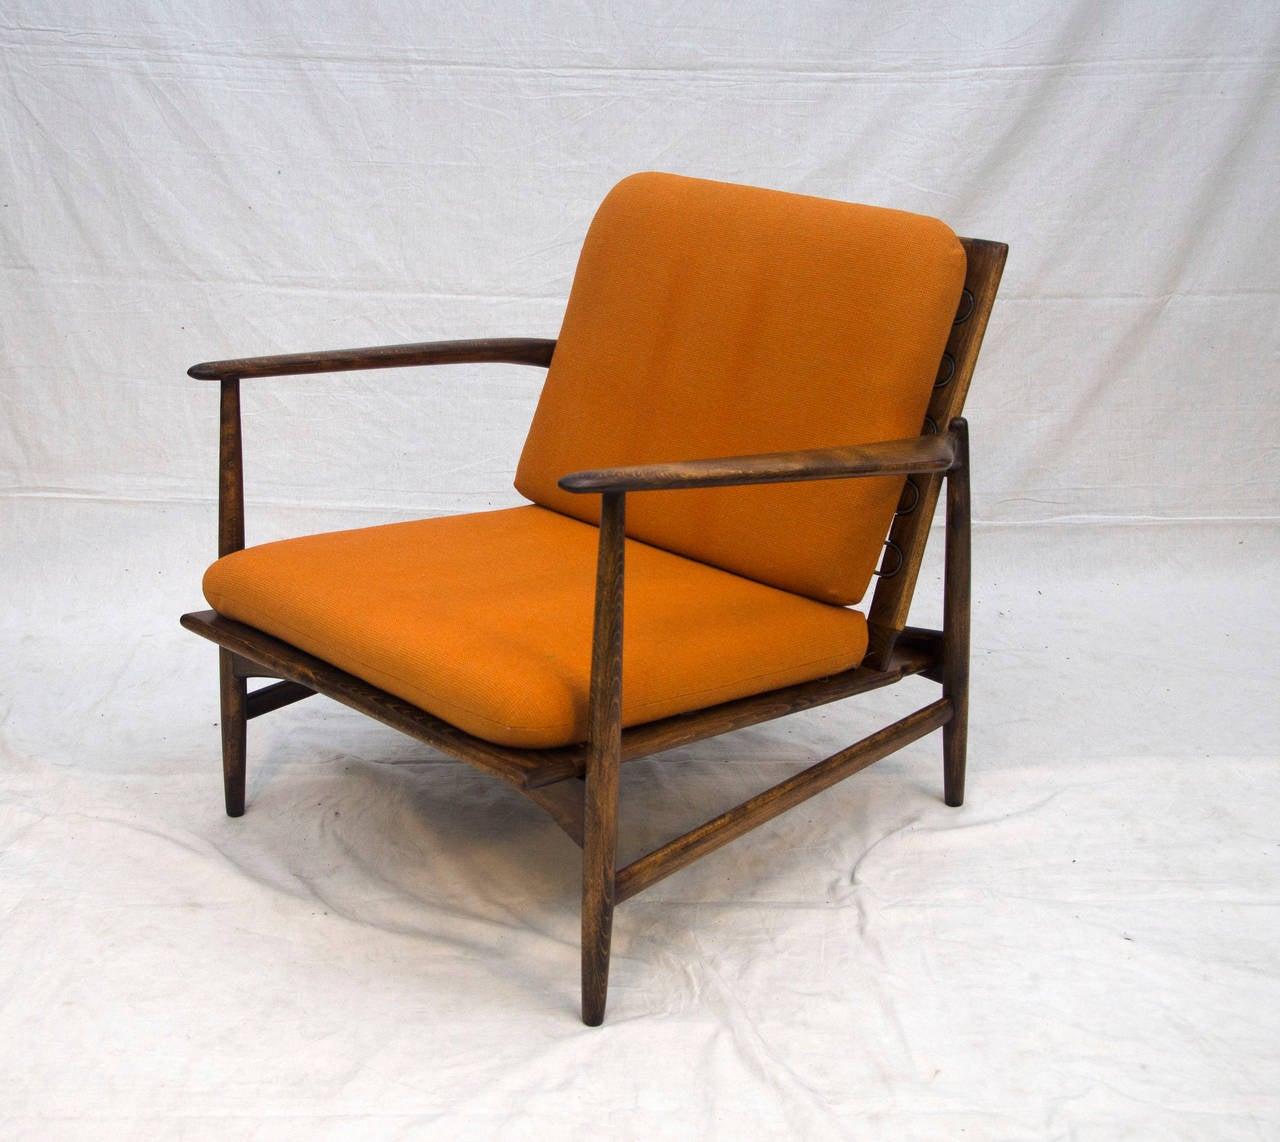 Danish Lounge Chair Selig Ib Kofod Larsen at 1stdibs